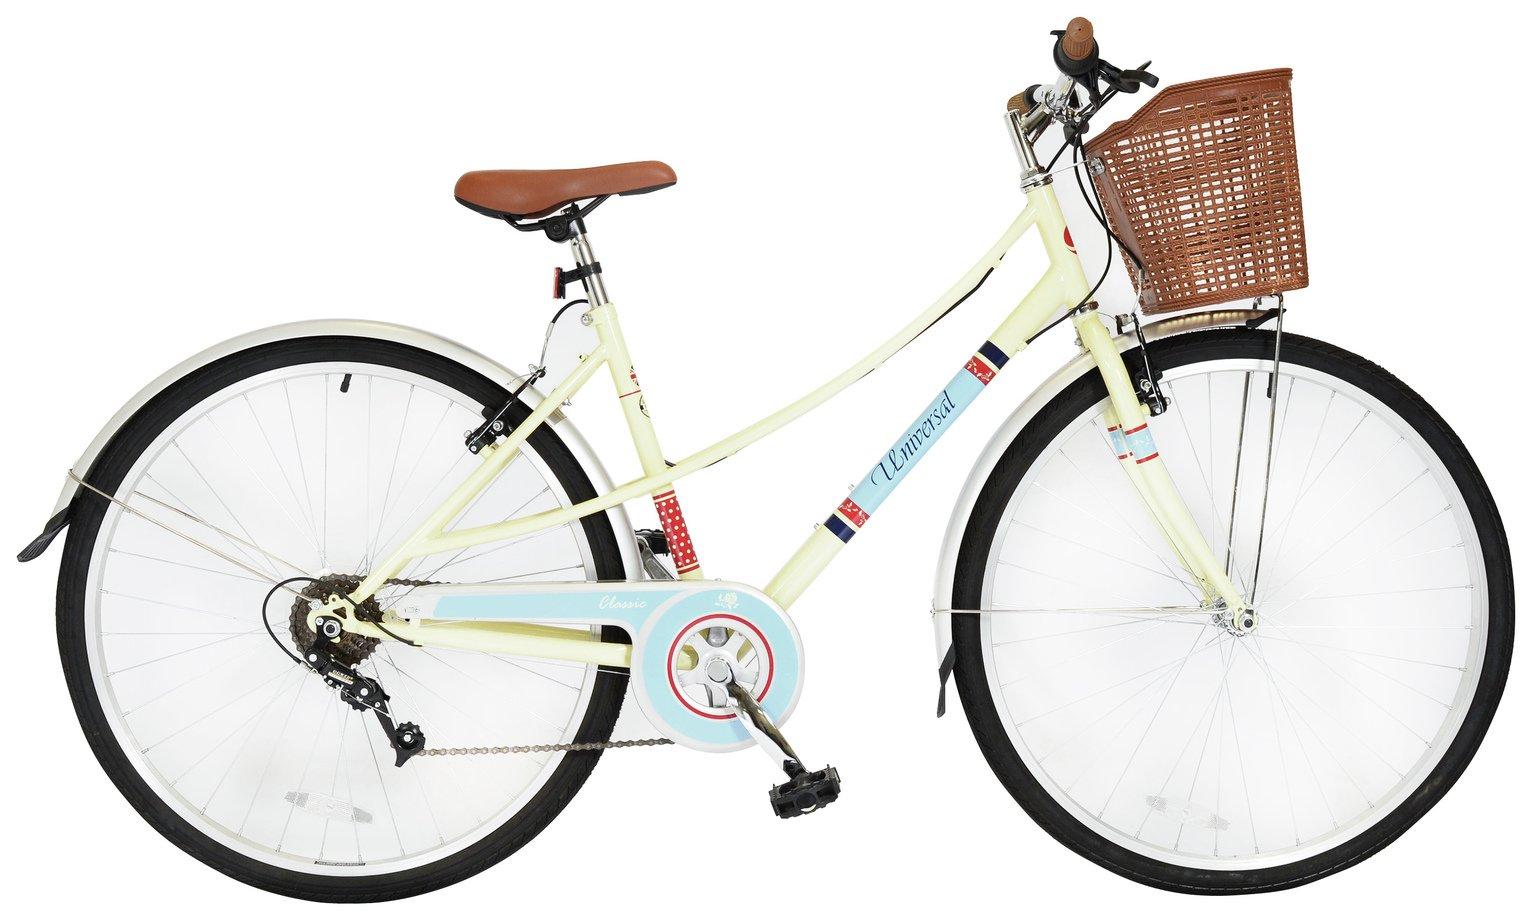 Universal Cycle MO37173 27.5'' Wheel Size Womens Hybrid Bike review